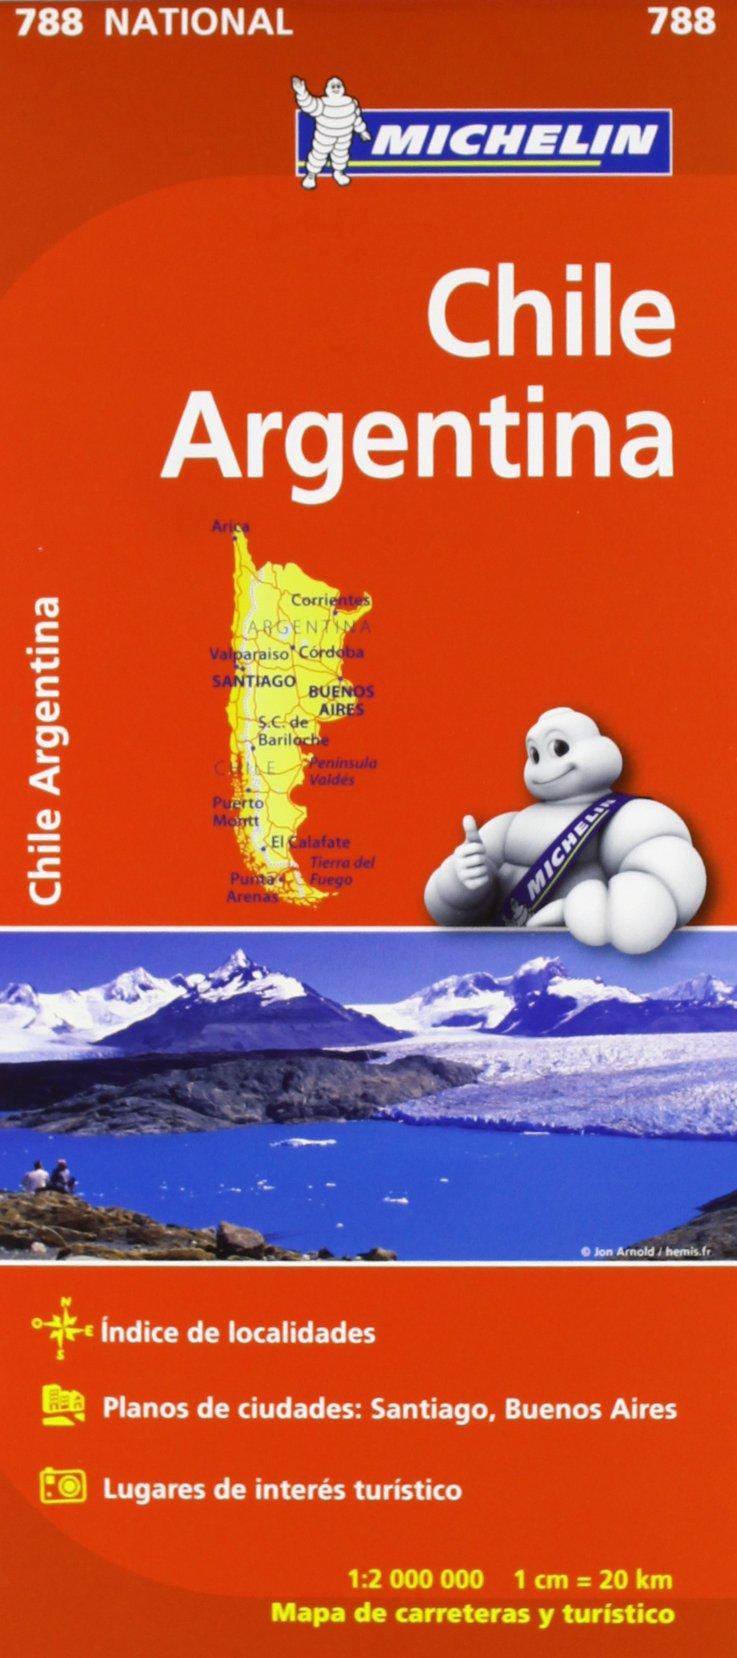 Chile Argentina Mapa National 788 Michelin 9782067185630